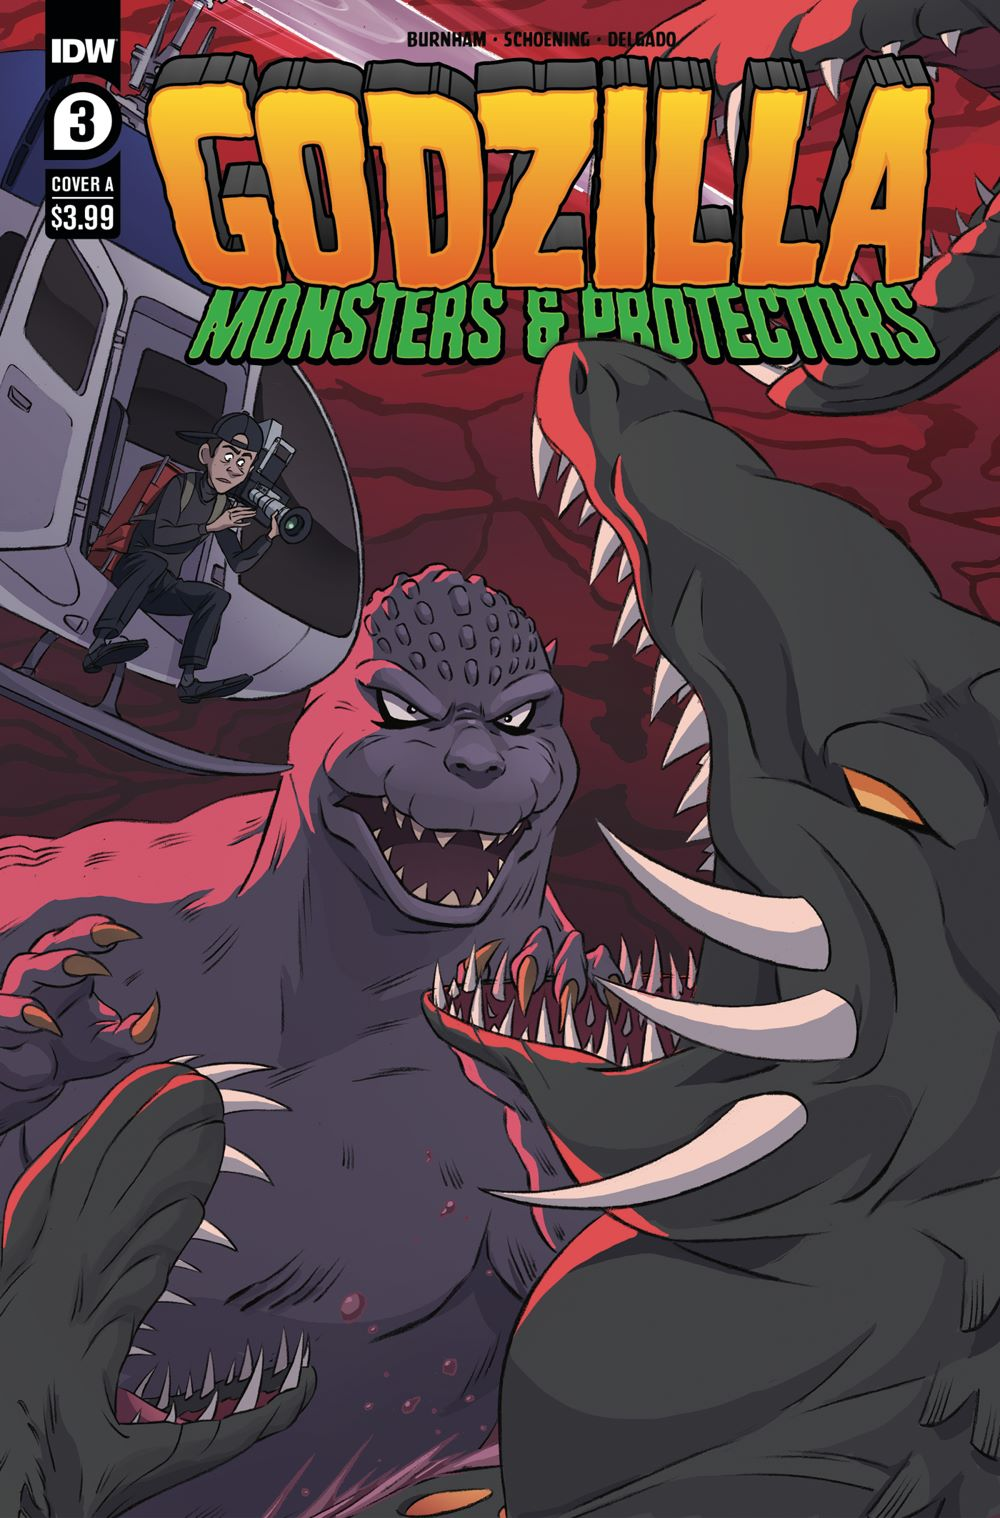 Godzilla_MP03-coverA ComicList: IDW Publishing New Releases for 06/16/2021